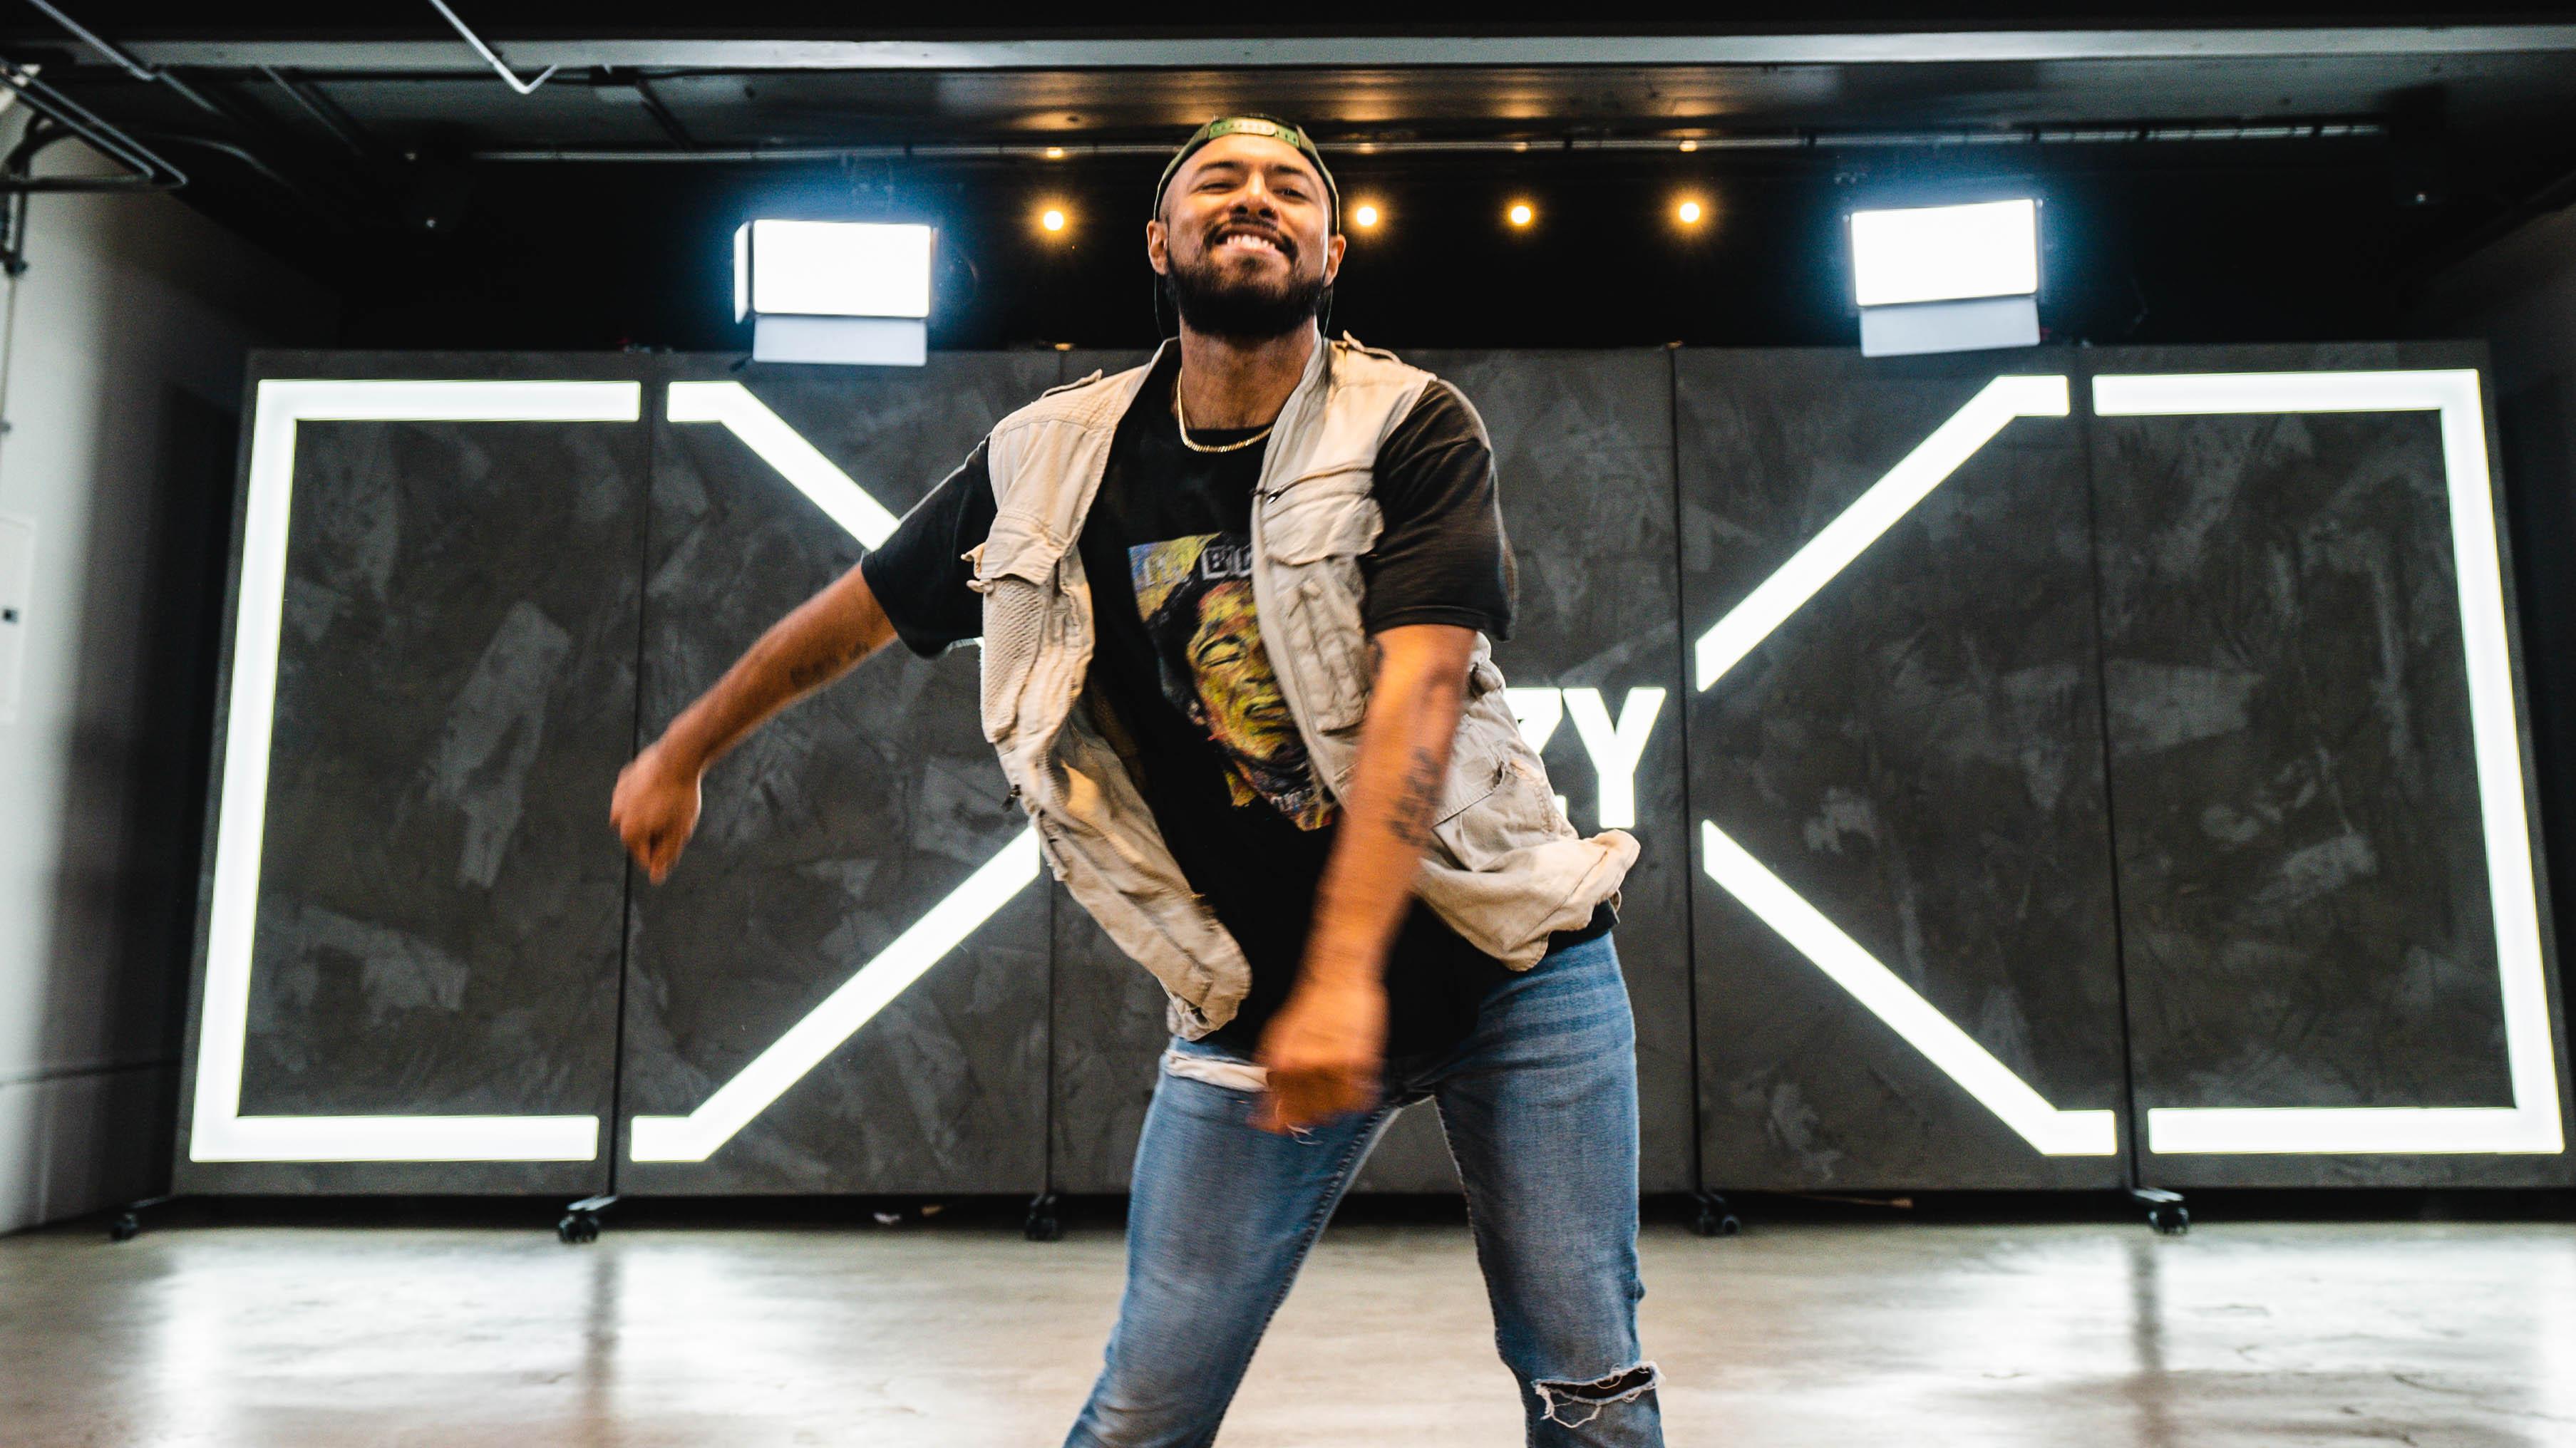 Brandon beastboi juezan doing the floss dance move